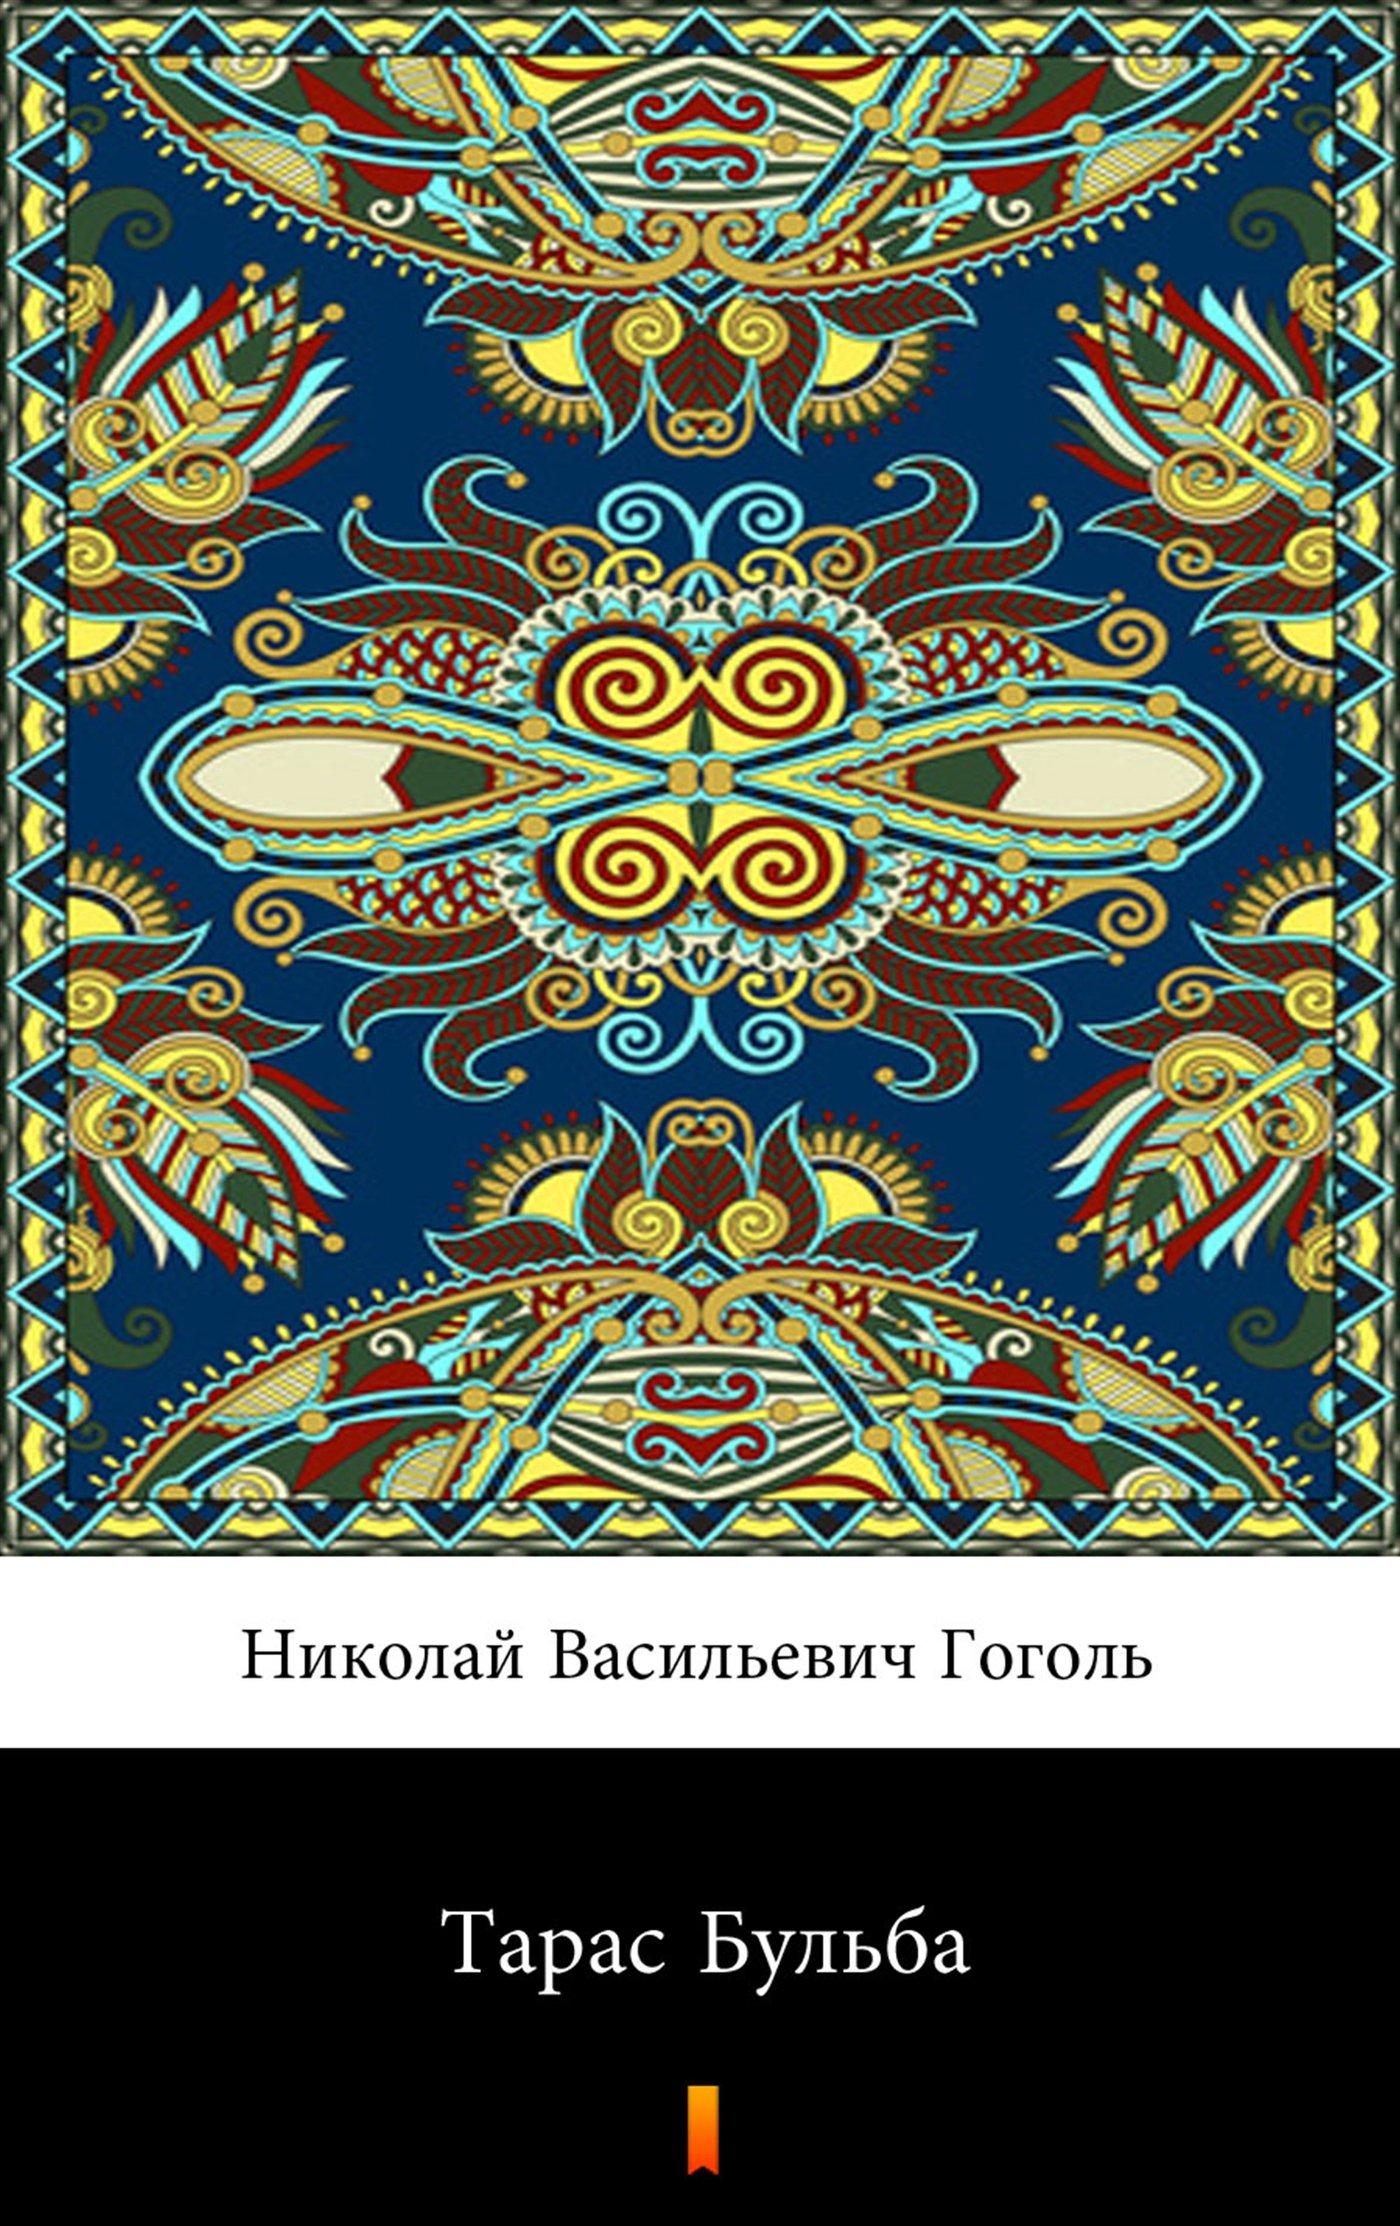 Тарас Бульба - Ebook (Książka EPUB) do pobrania w formacie EPUB